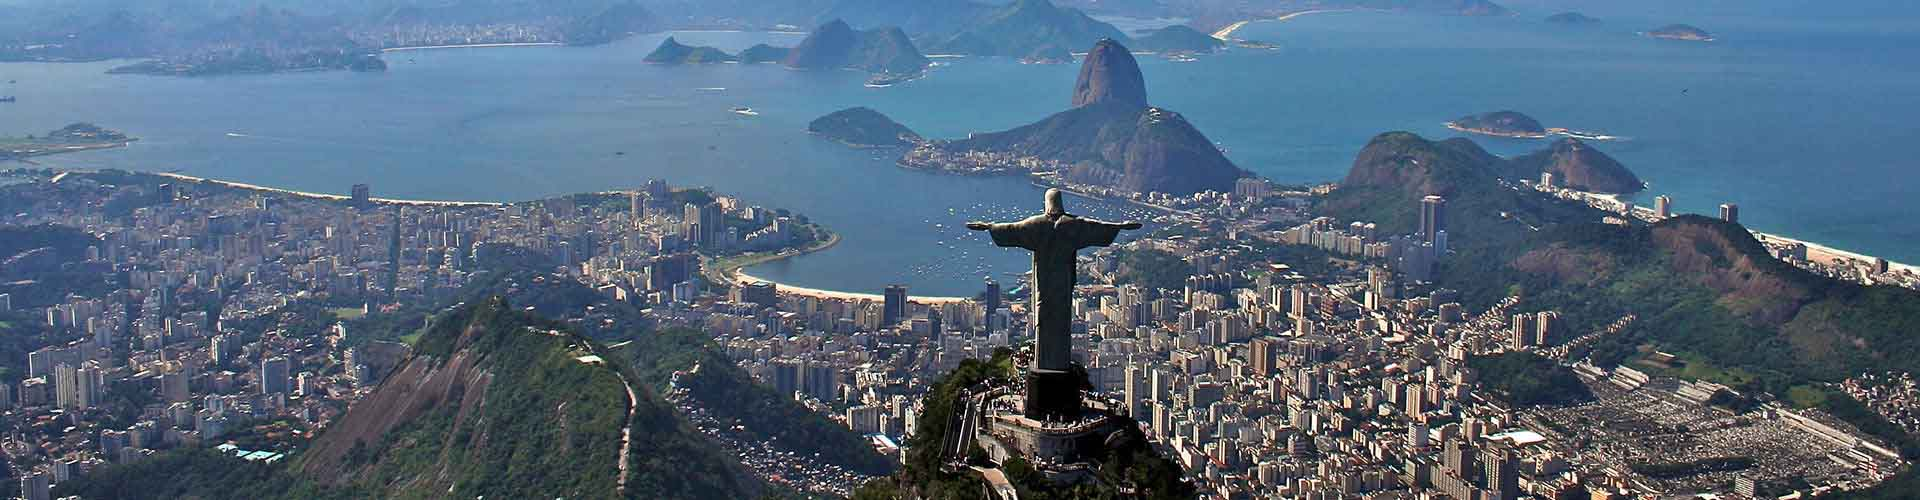 Rio de Janeiro - Chambres pas chères dans le quartier de Copacabana. Cartes pour Rio de Janeiro, photos et commentaires pour chaque chambre à Rio de Janeiro.